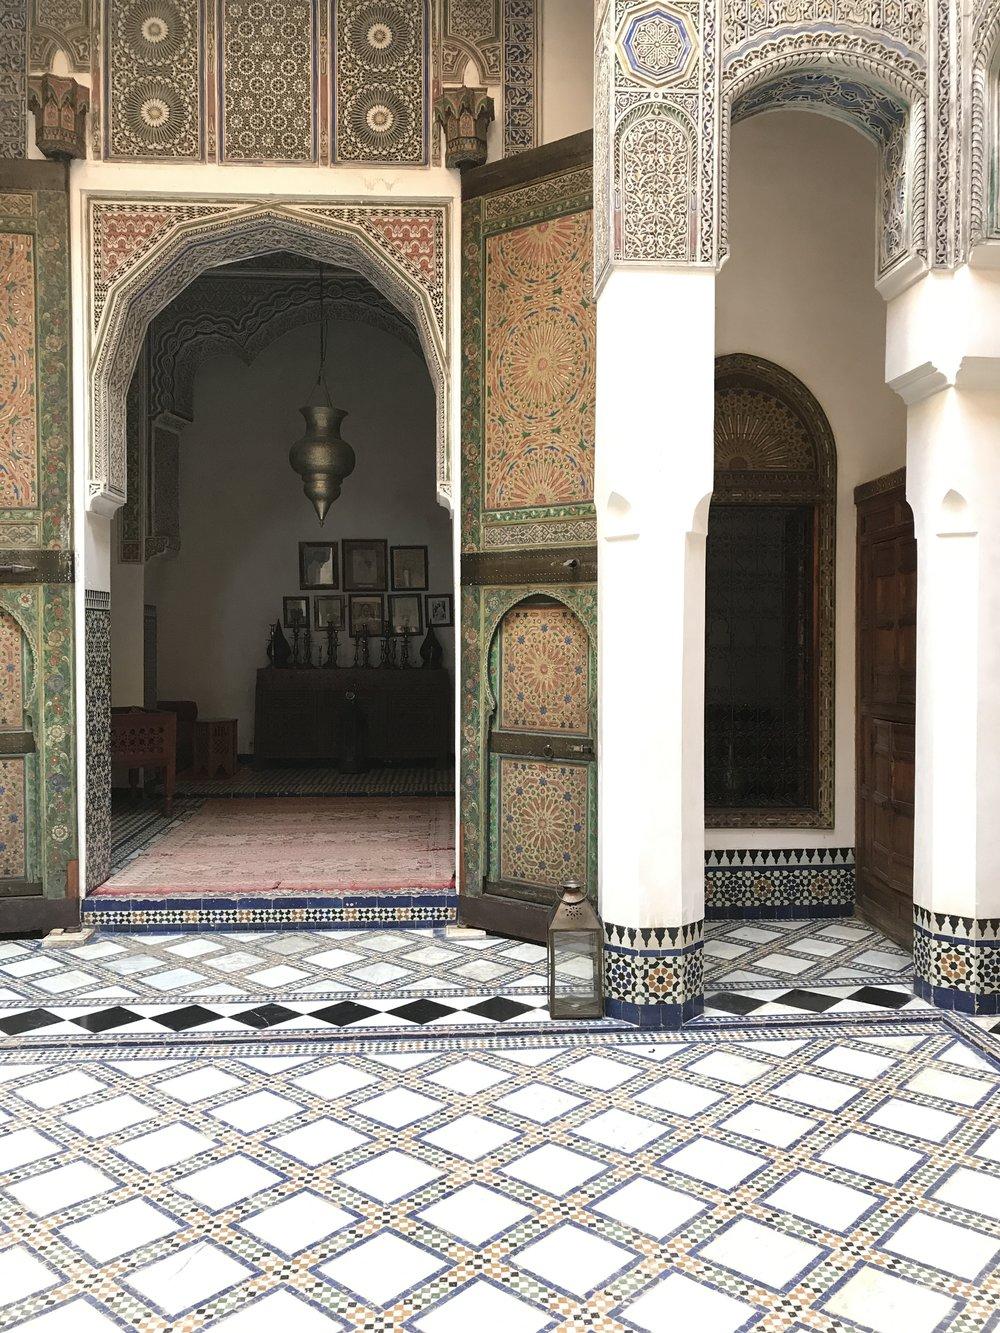 The internal courtyard at Dar Saffarine.